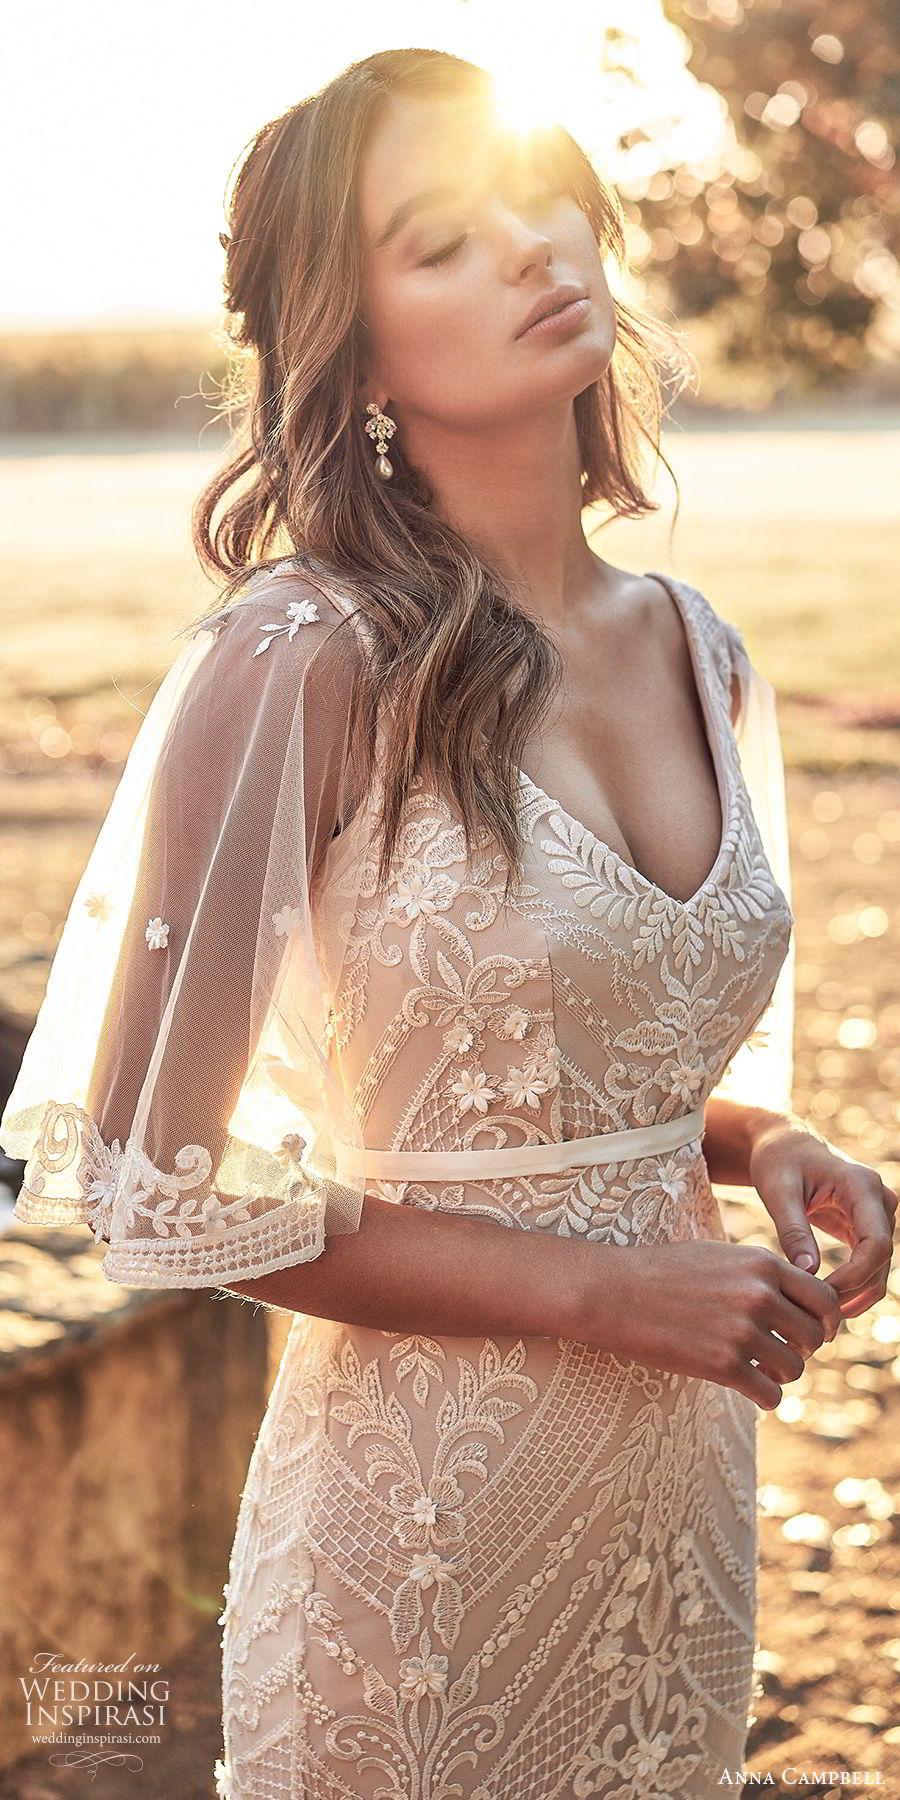 anna campbell 2020 bridal illusion flutter sleees sleeveless thick straps deep v neckline fully embellished embroidered lace sheath wedding dress (9) elegant v back chapel train zv